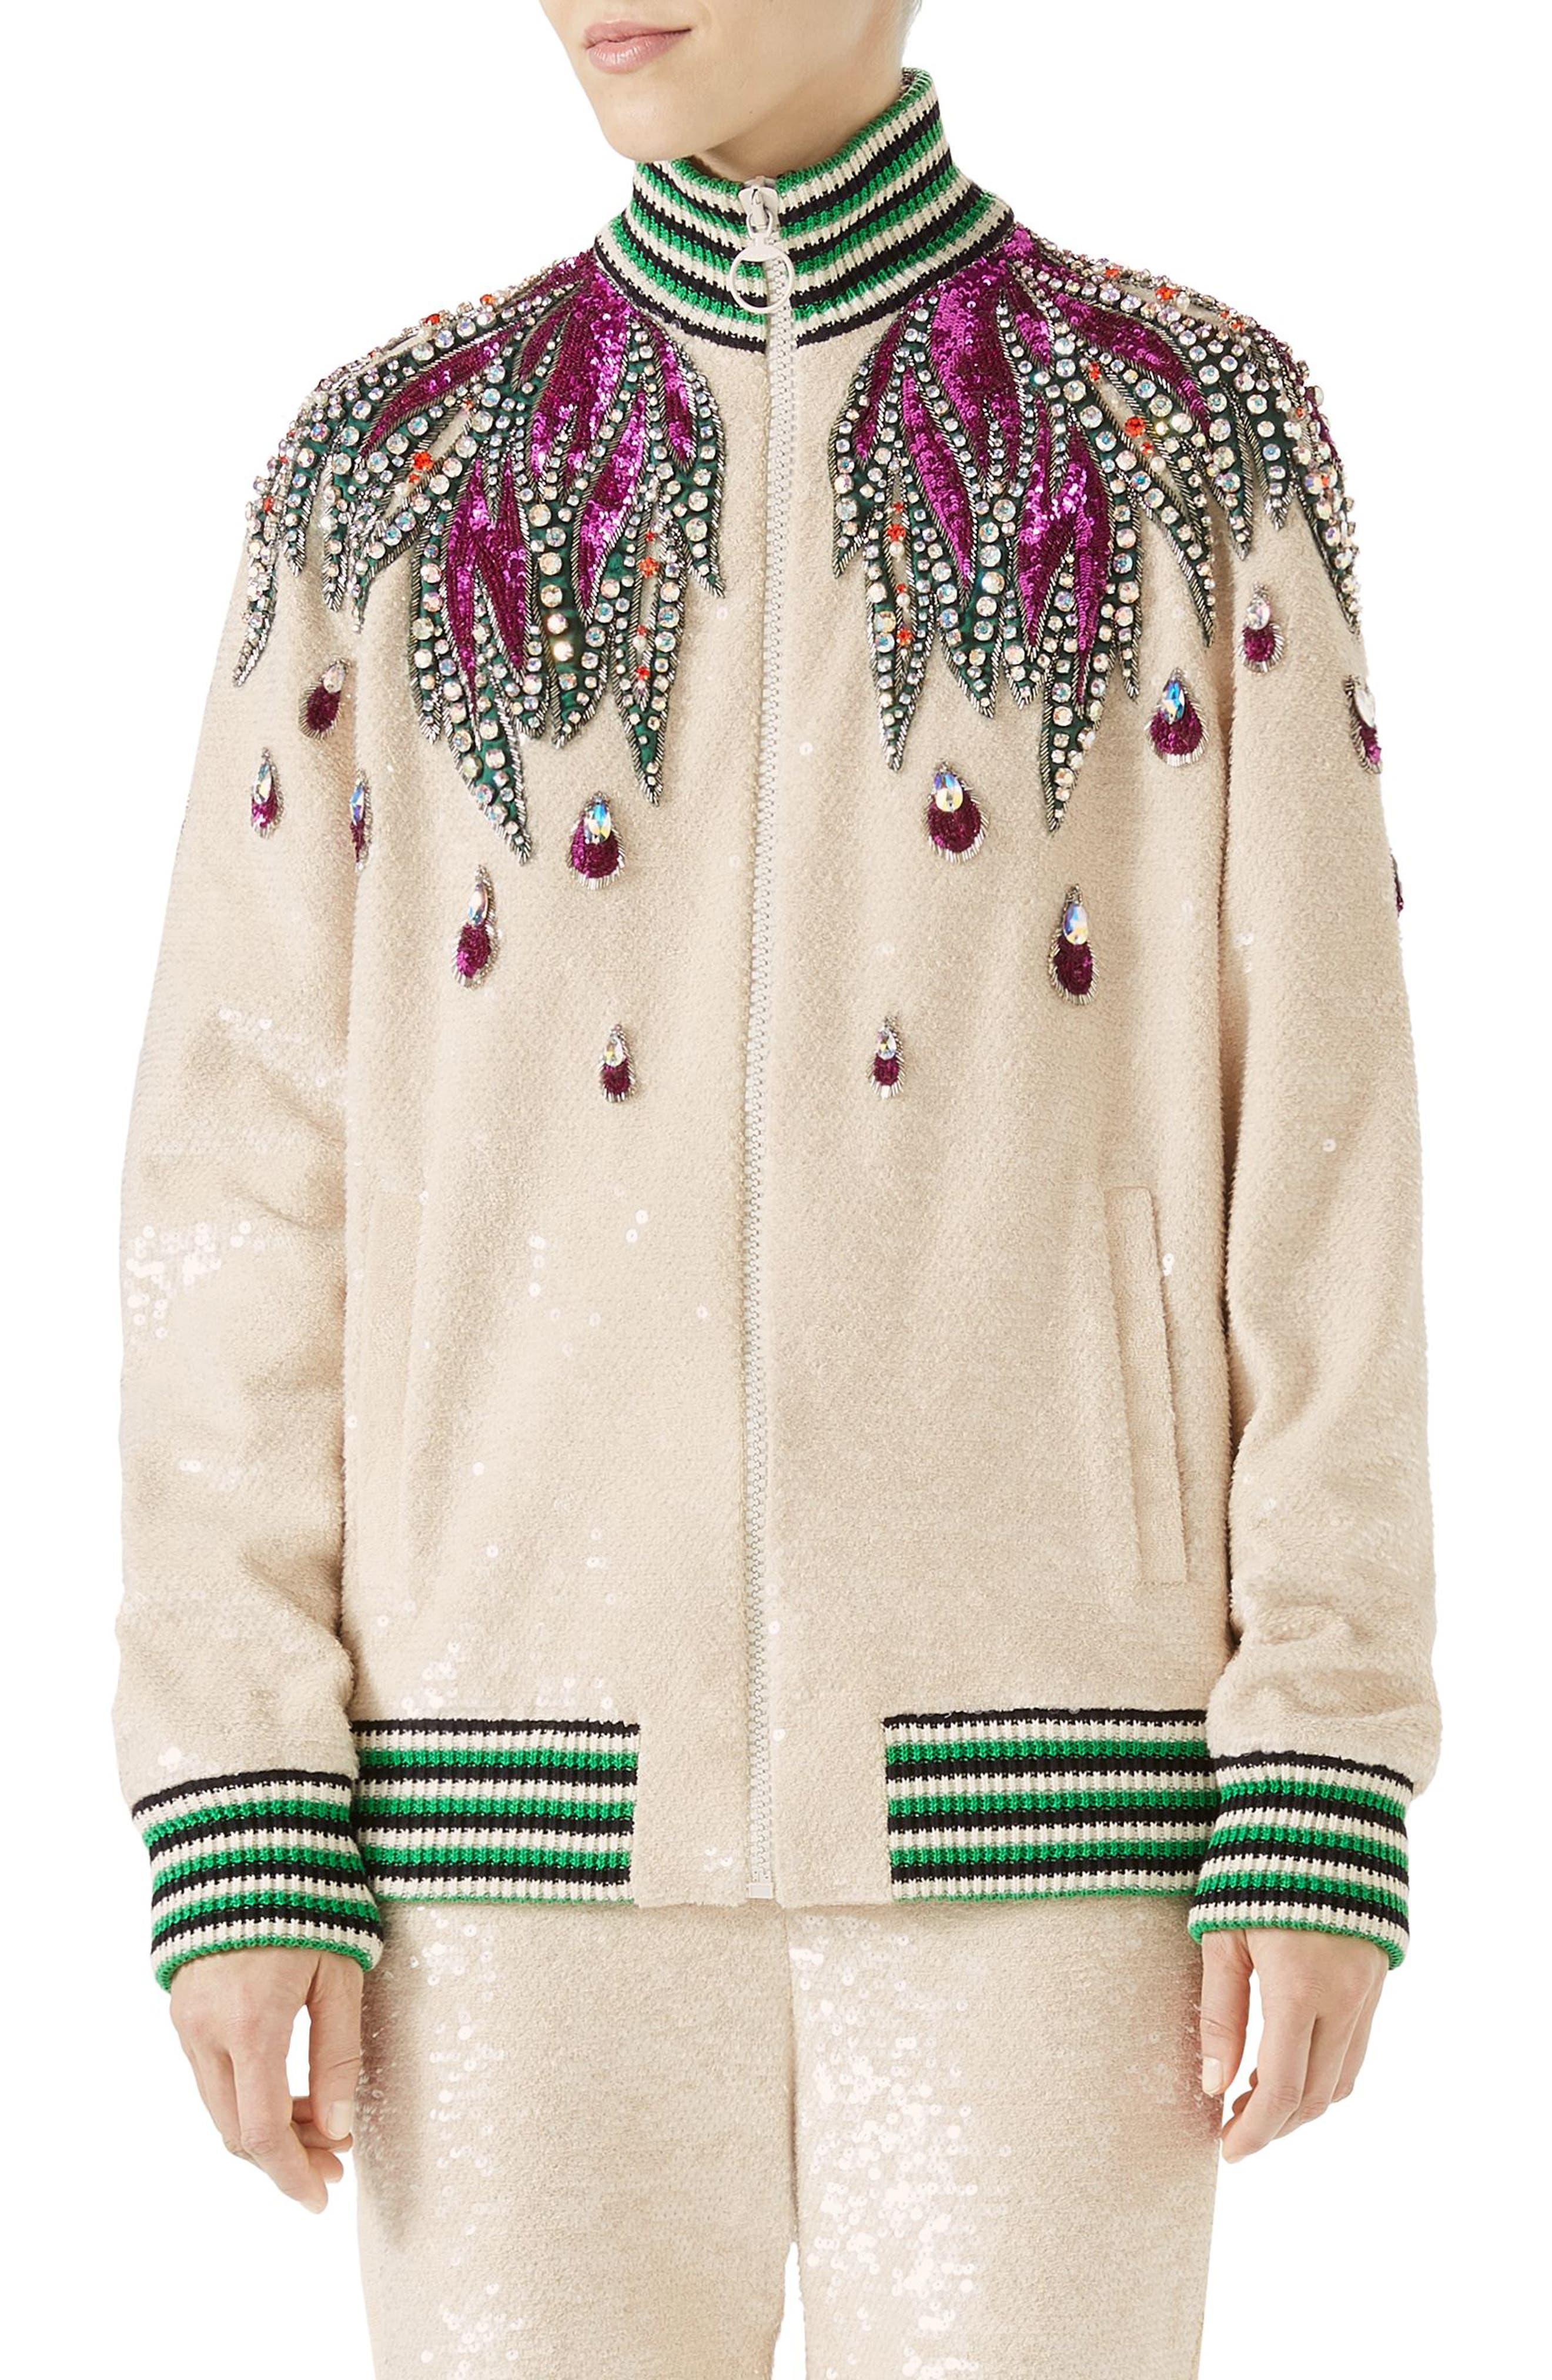 Embellished Track Jacket,                             Main thumbnail 1, color,                             GARDENIA/ MULTICOLOR